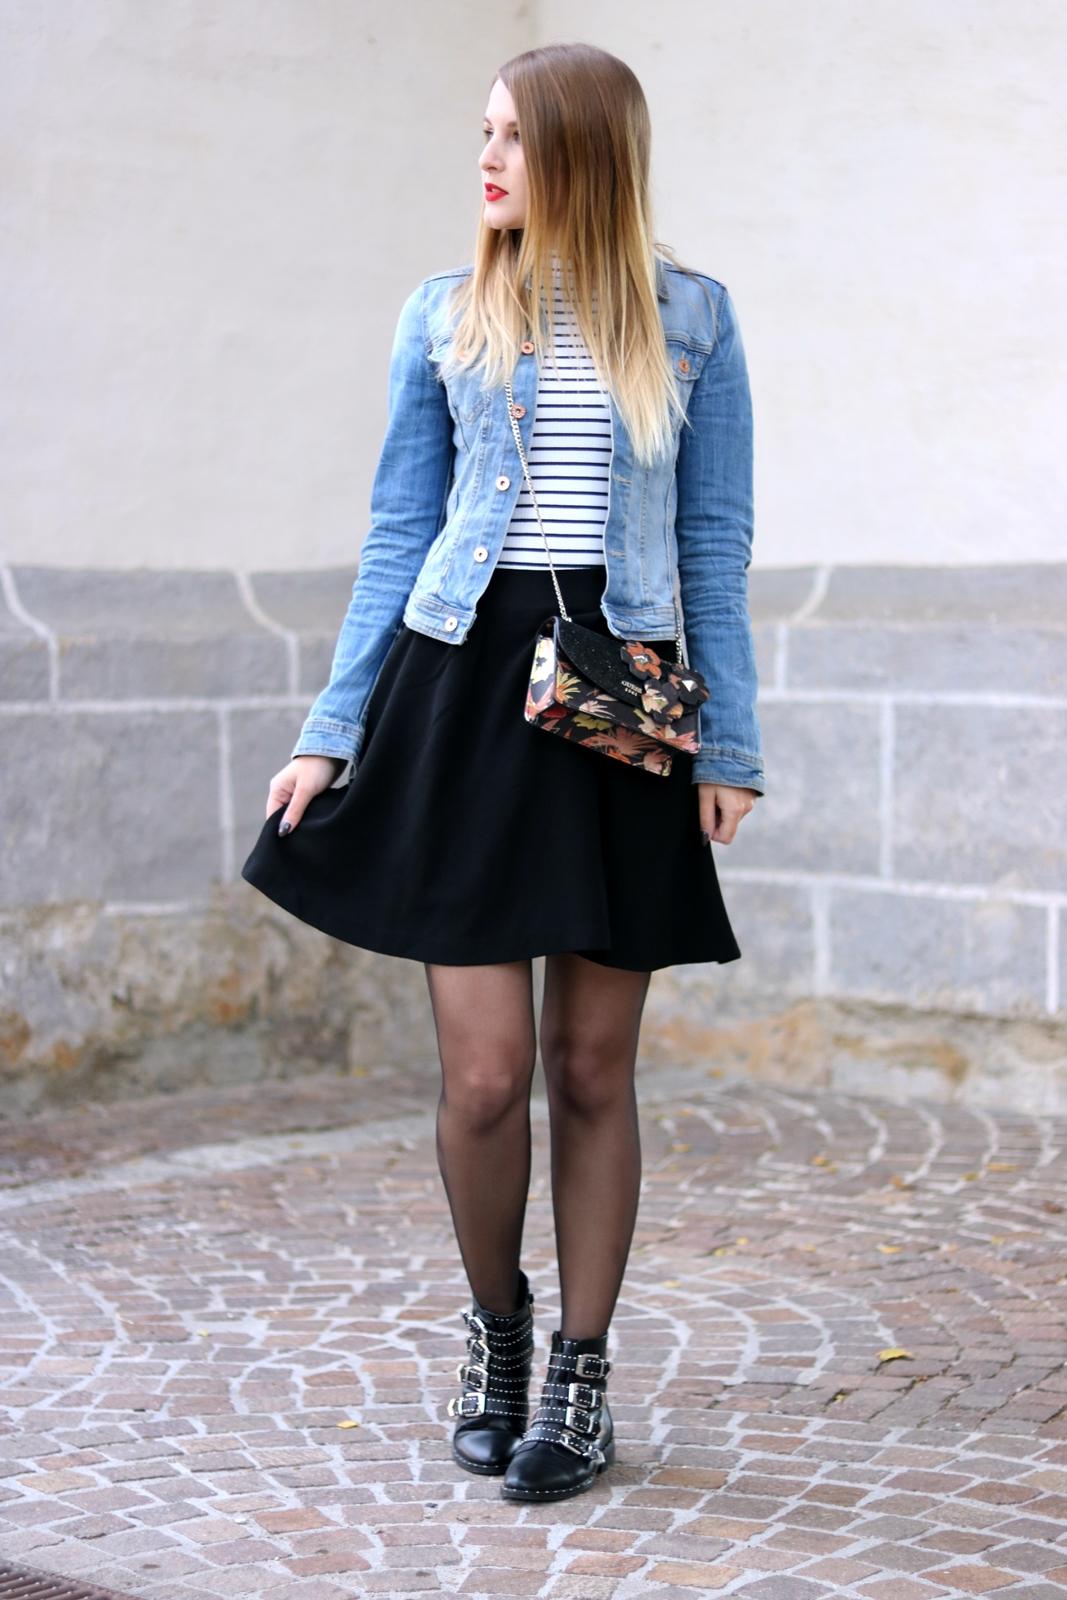 hot sale online d5c46 923a8 Zeitlose Modeklassiker #1 Die Jeansjacke - Fashionladyloves